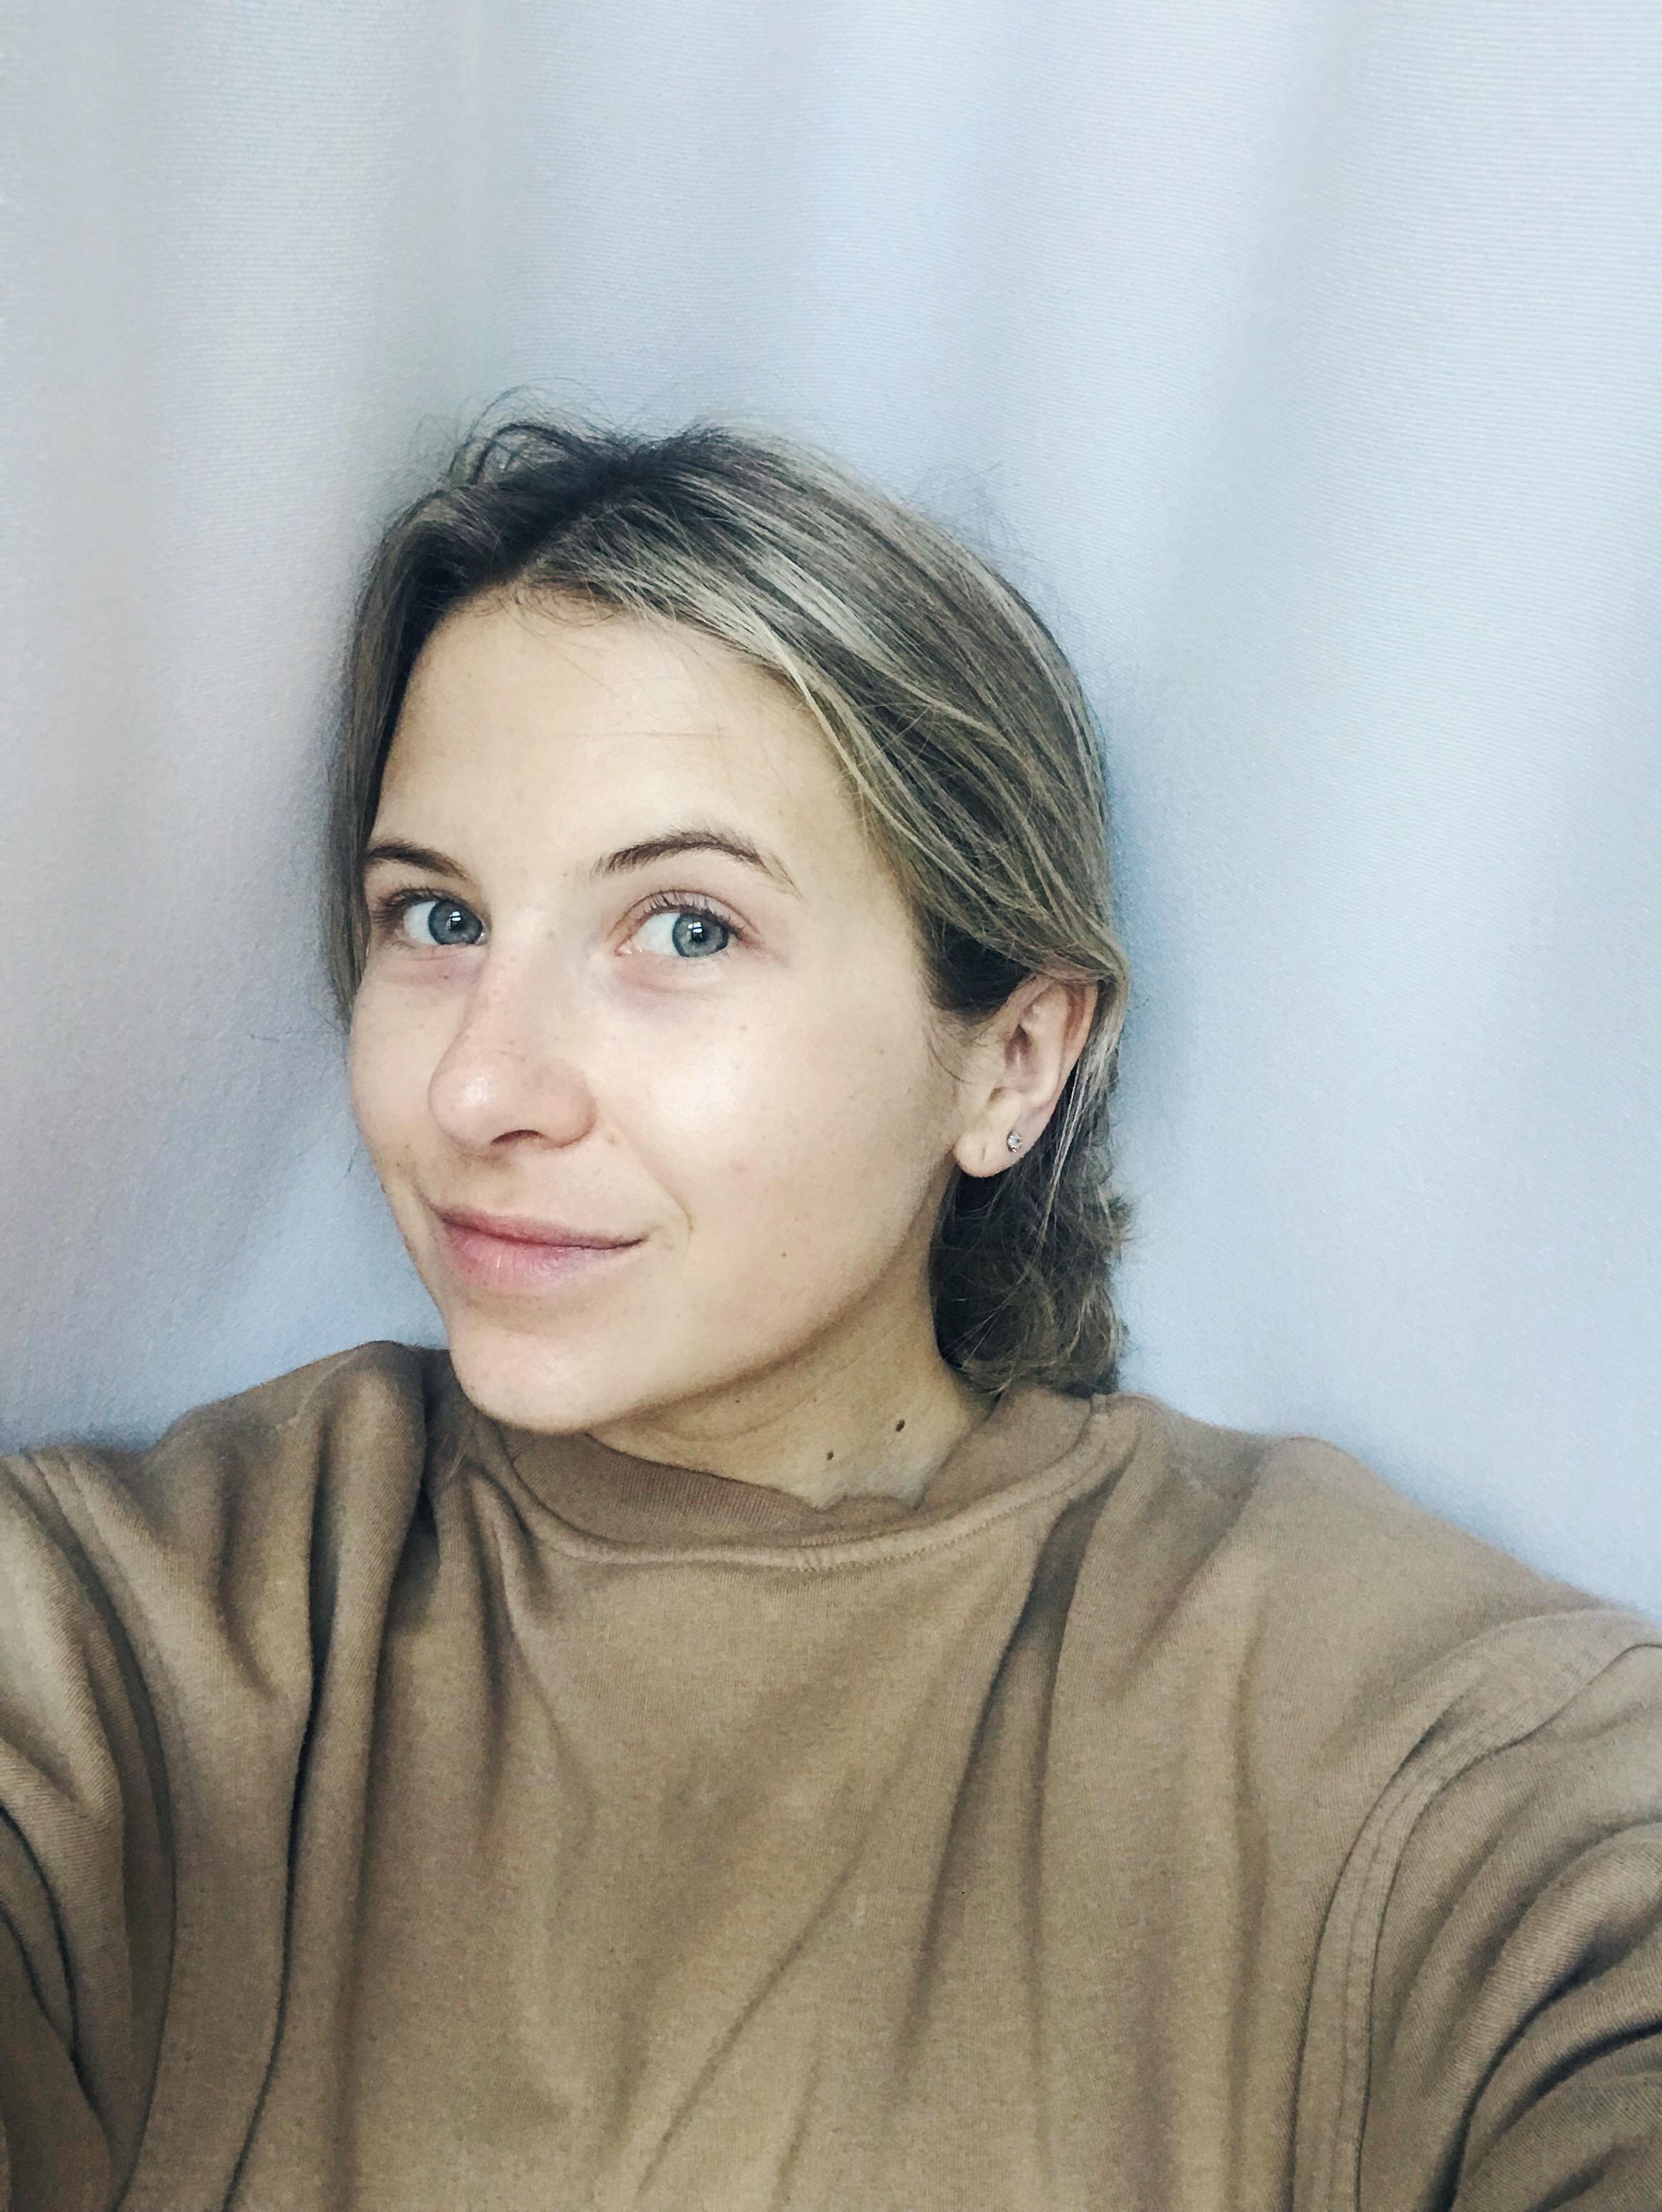 Ansiktsmask _ Henrietta Fromholtz